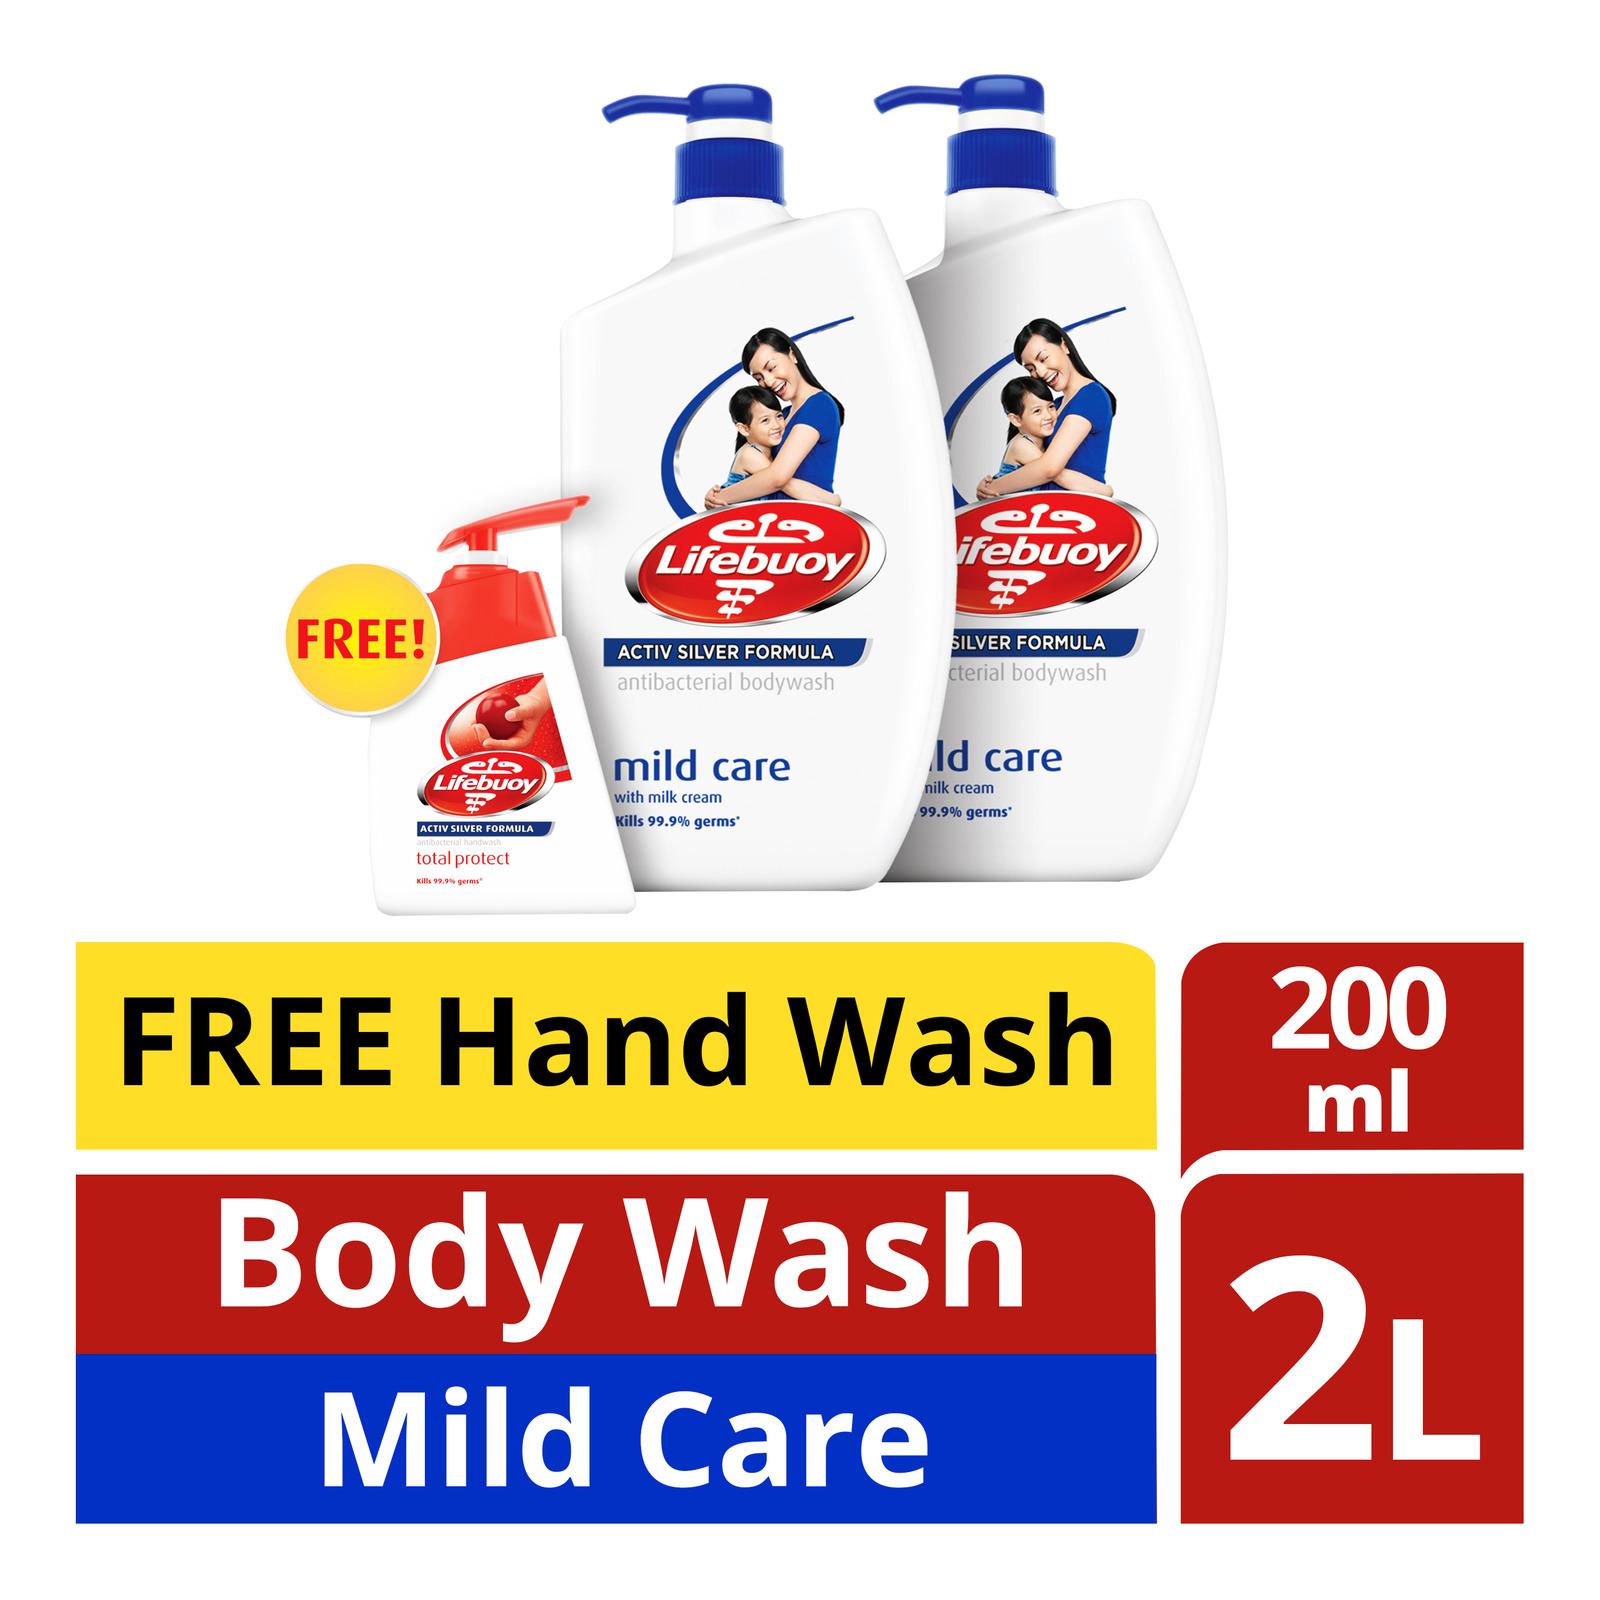 Lifebuoy Antibacterial Body Wash - Mild Care+HandWash